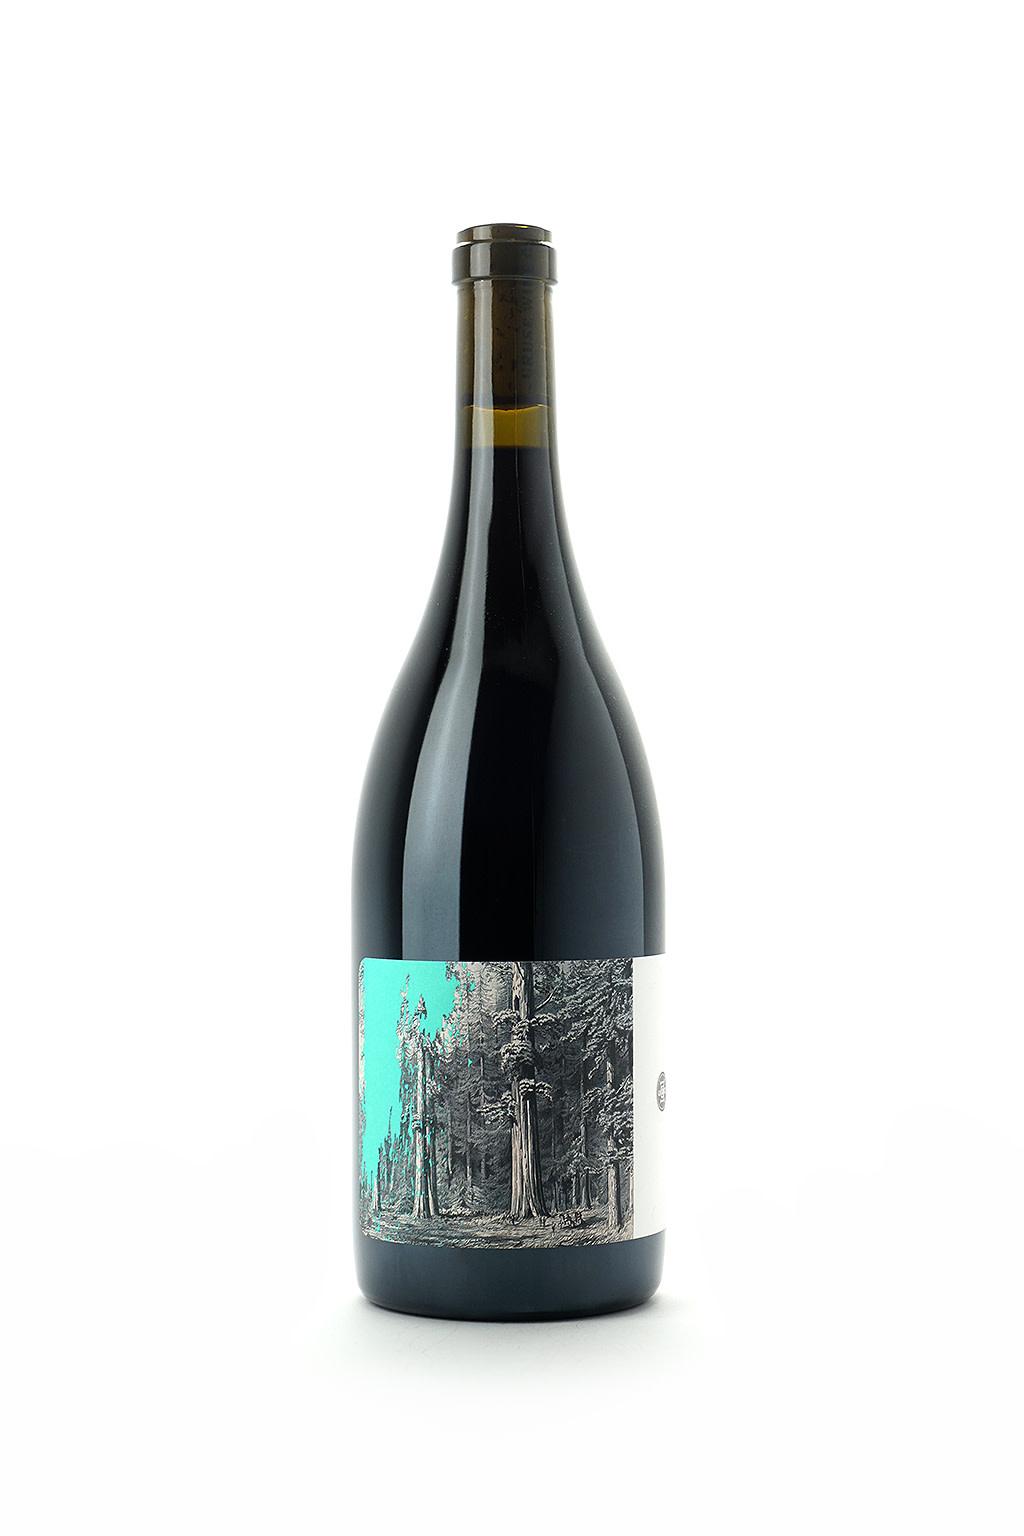 Cruse Wine Co Tannat Alder Springs Vyd 2018